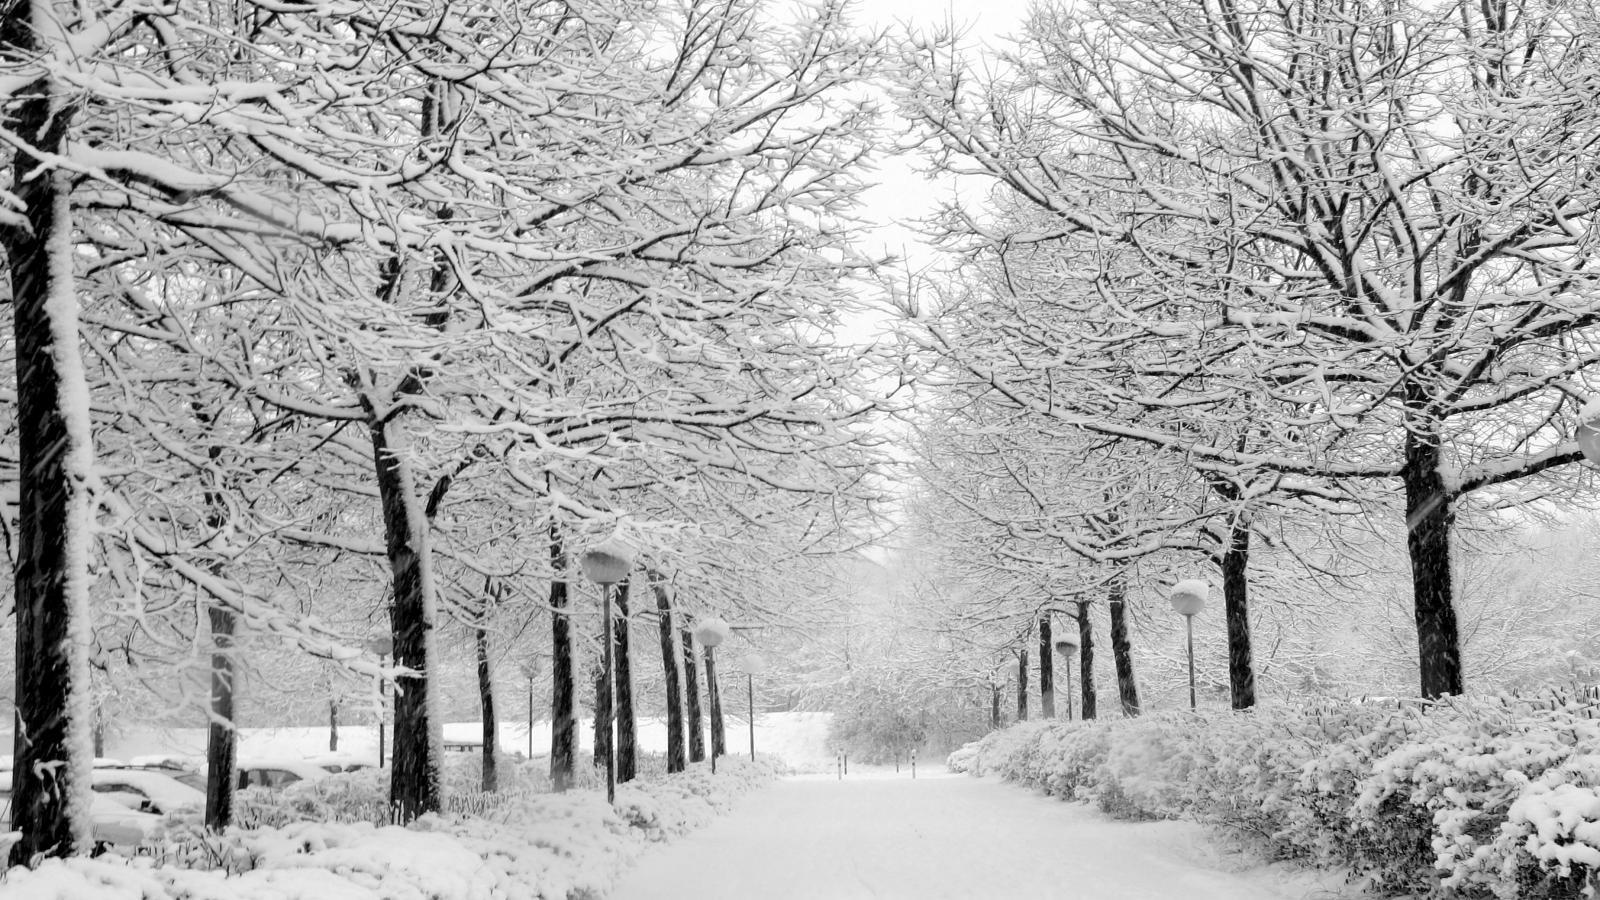 1600x900 hd desktop wallpaper winter - photo #14